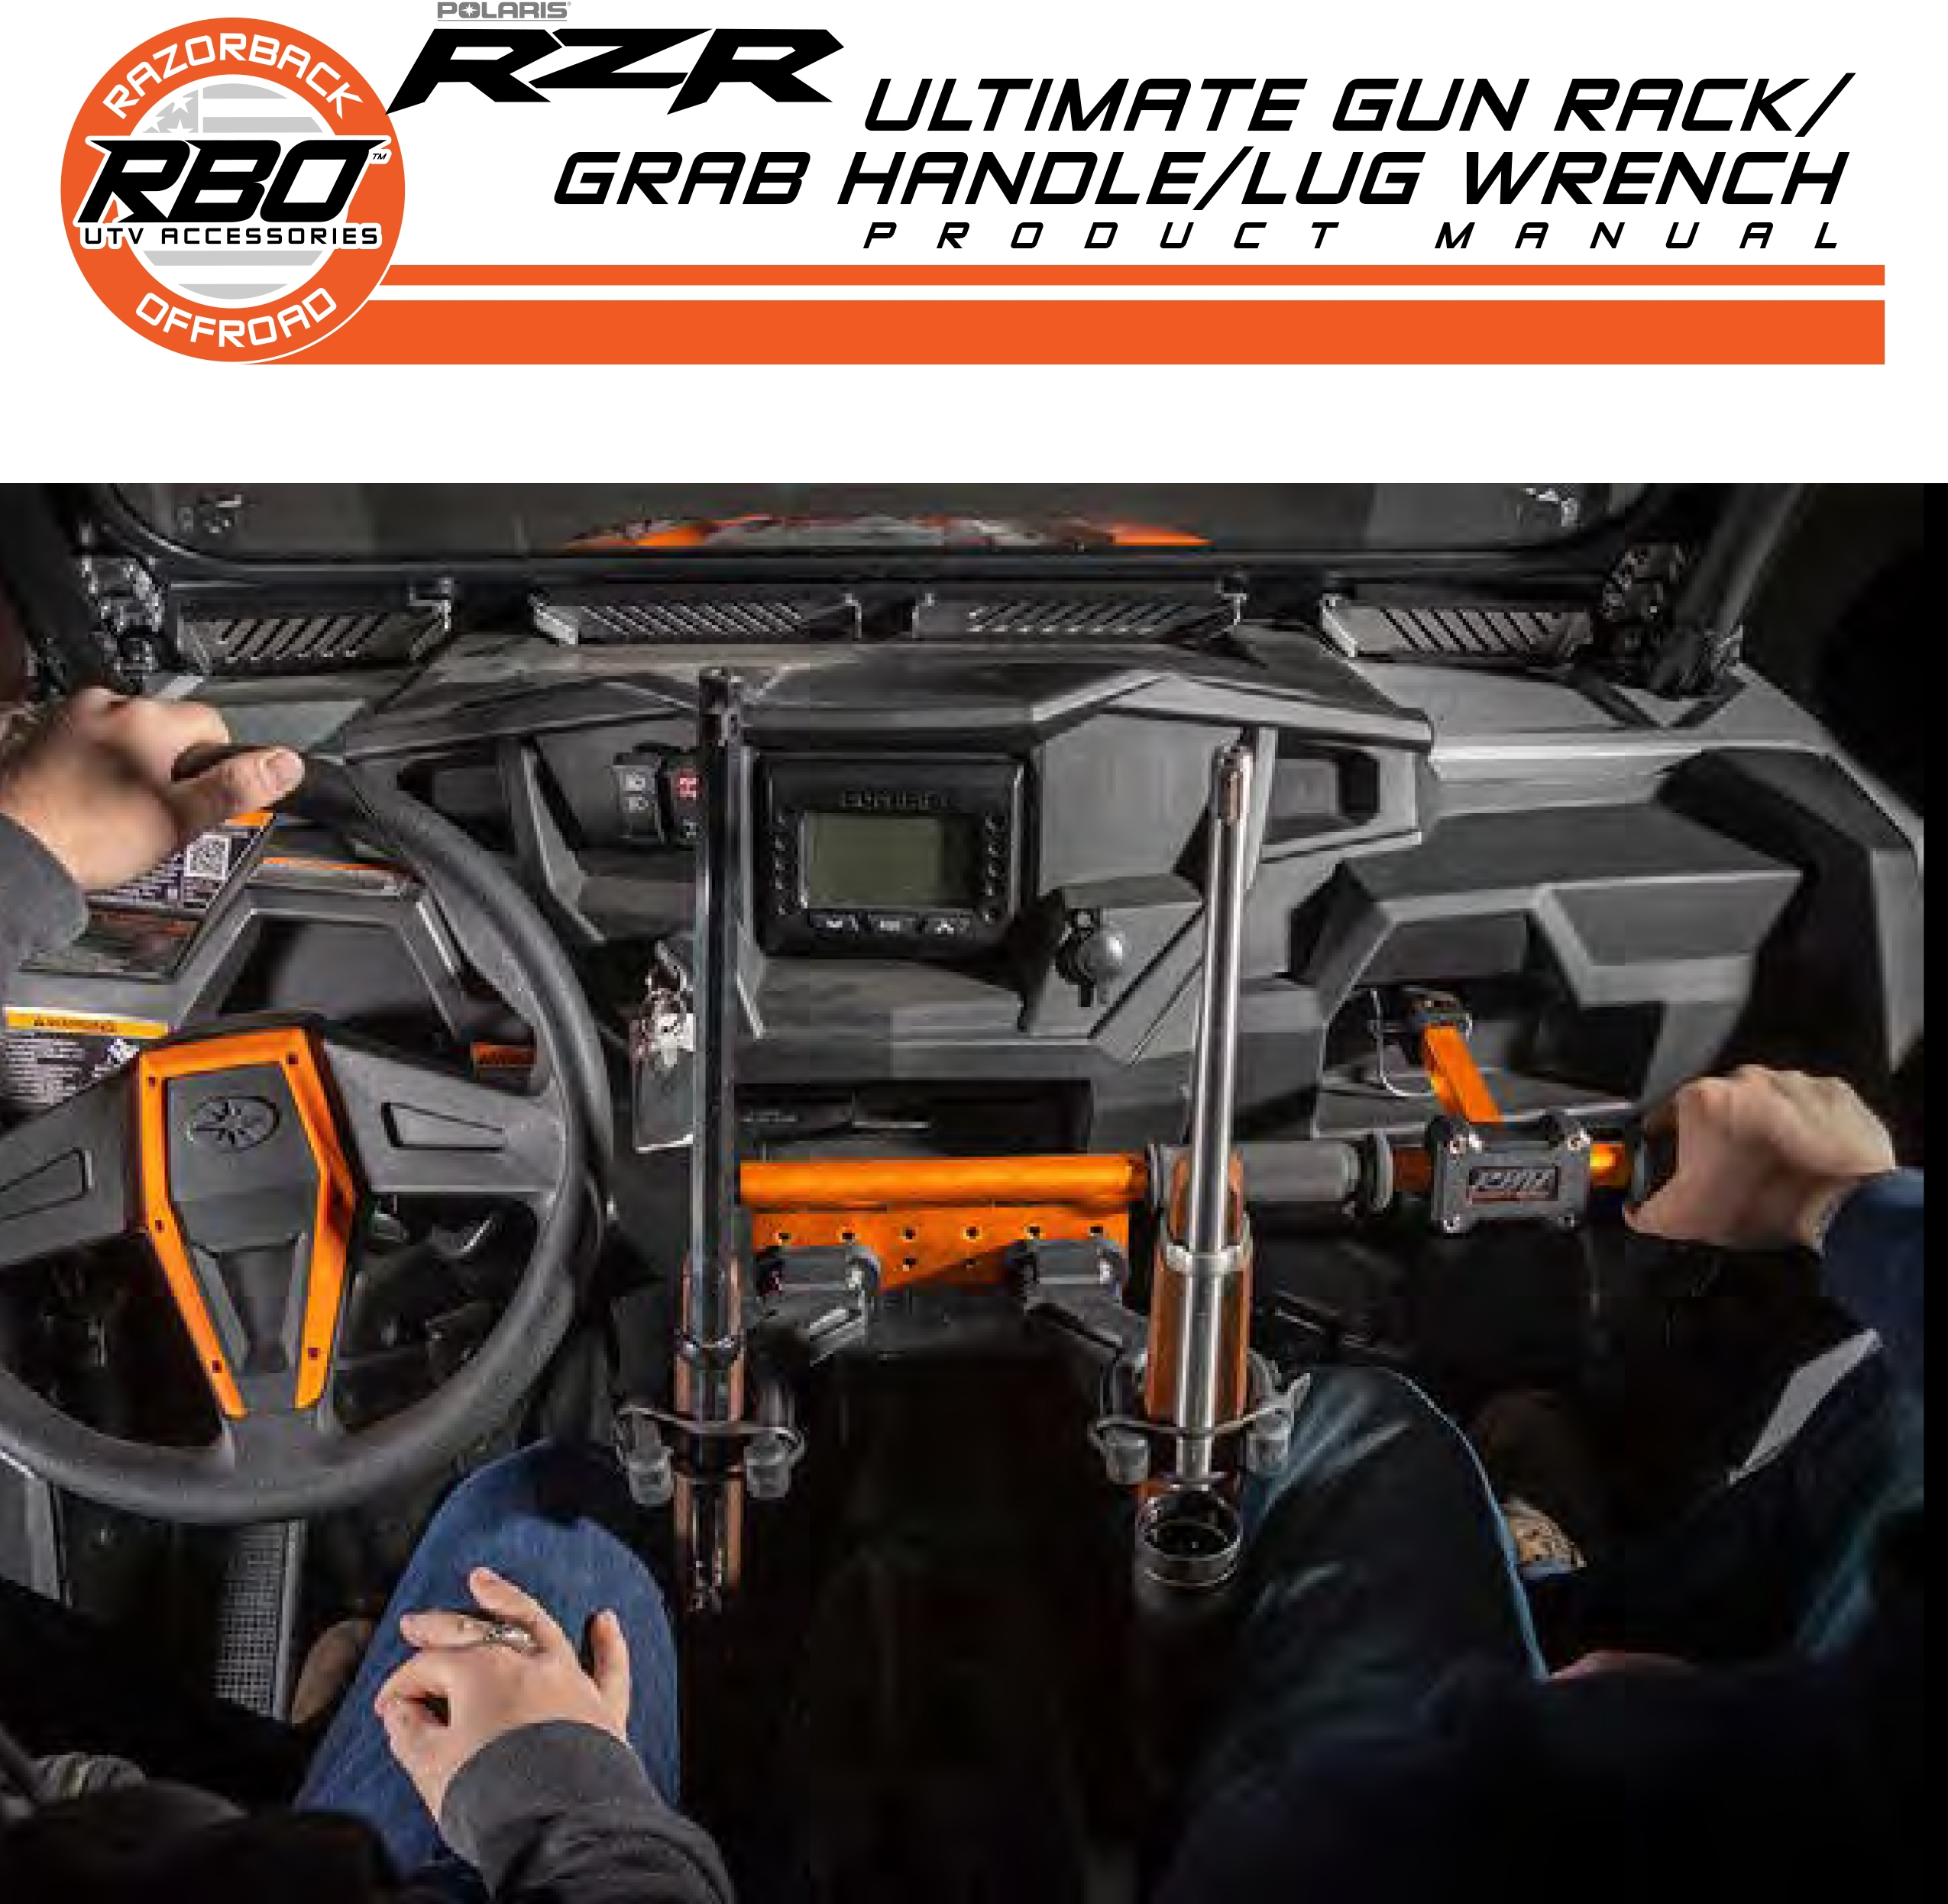 RBO Ultimate Gun Mount Grab Handle Lug Wrench Product Manual